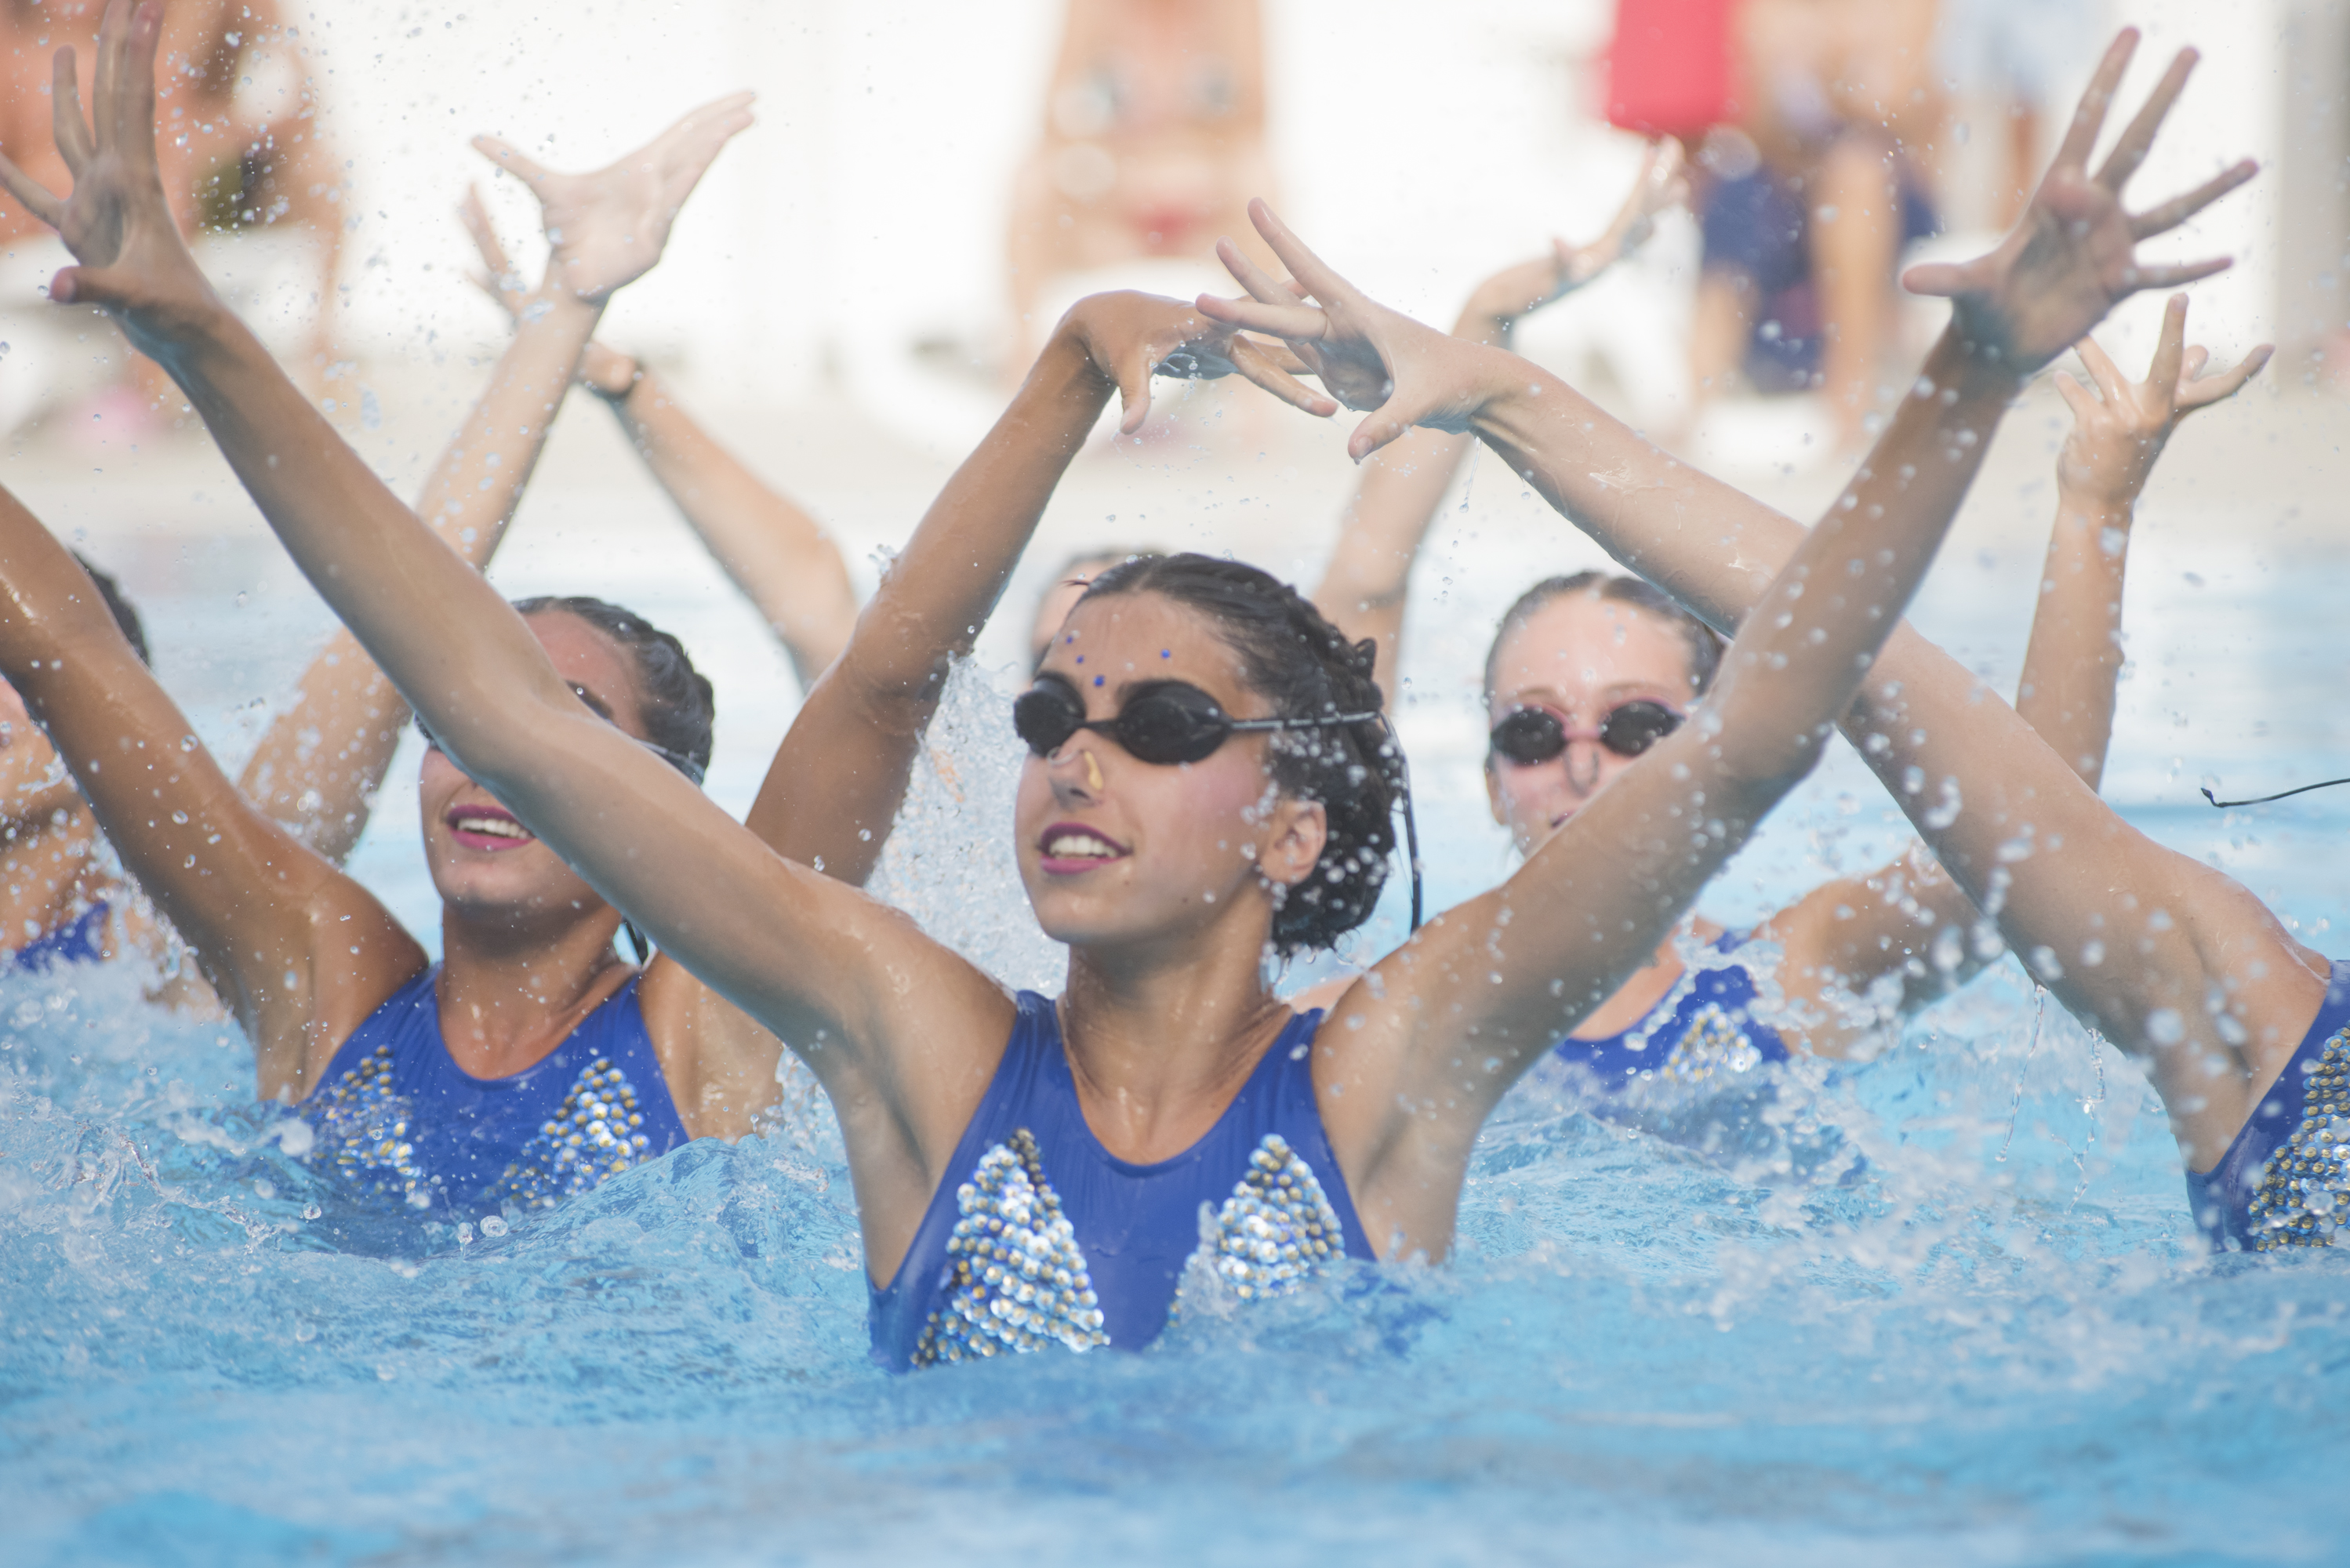 Nadadoras de natación sincronizada